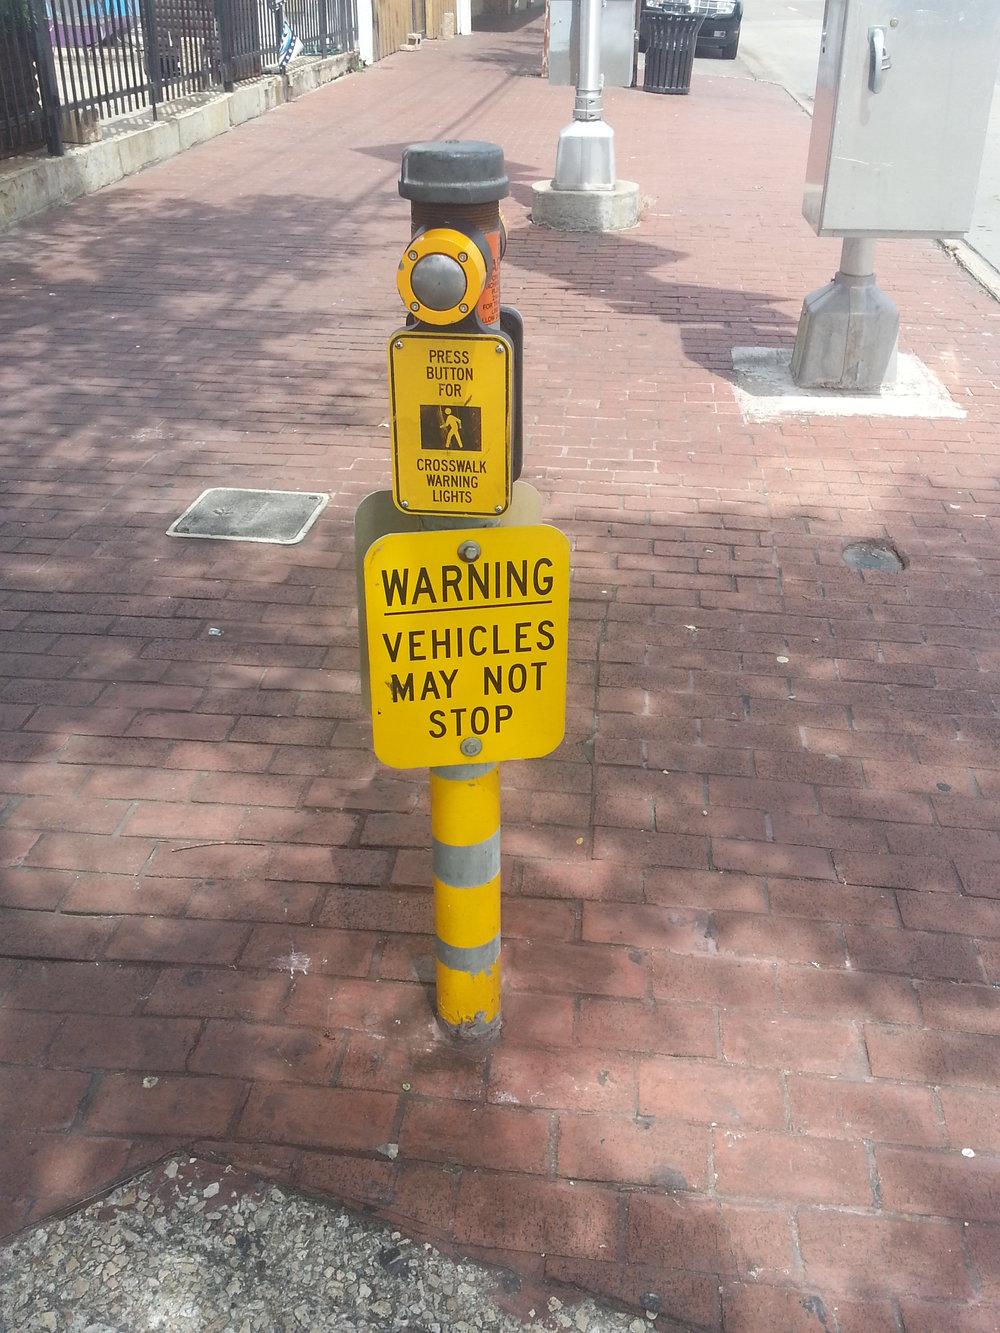 vehicles may not stop